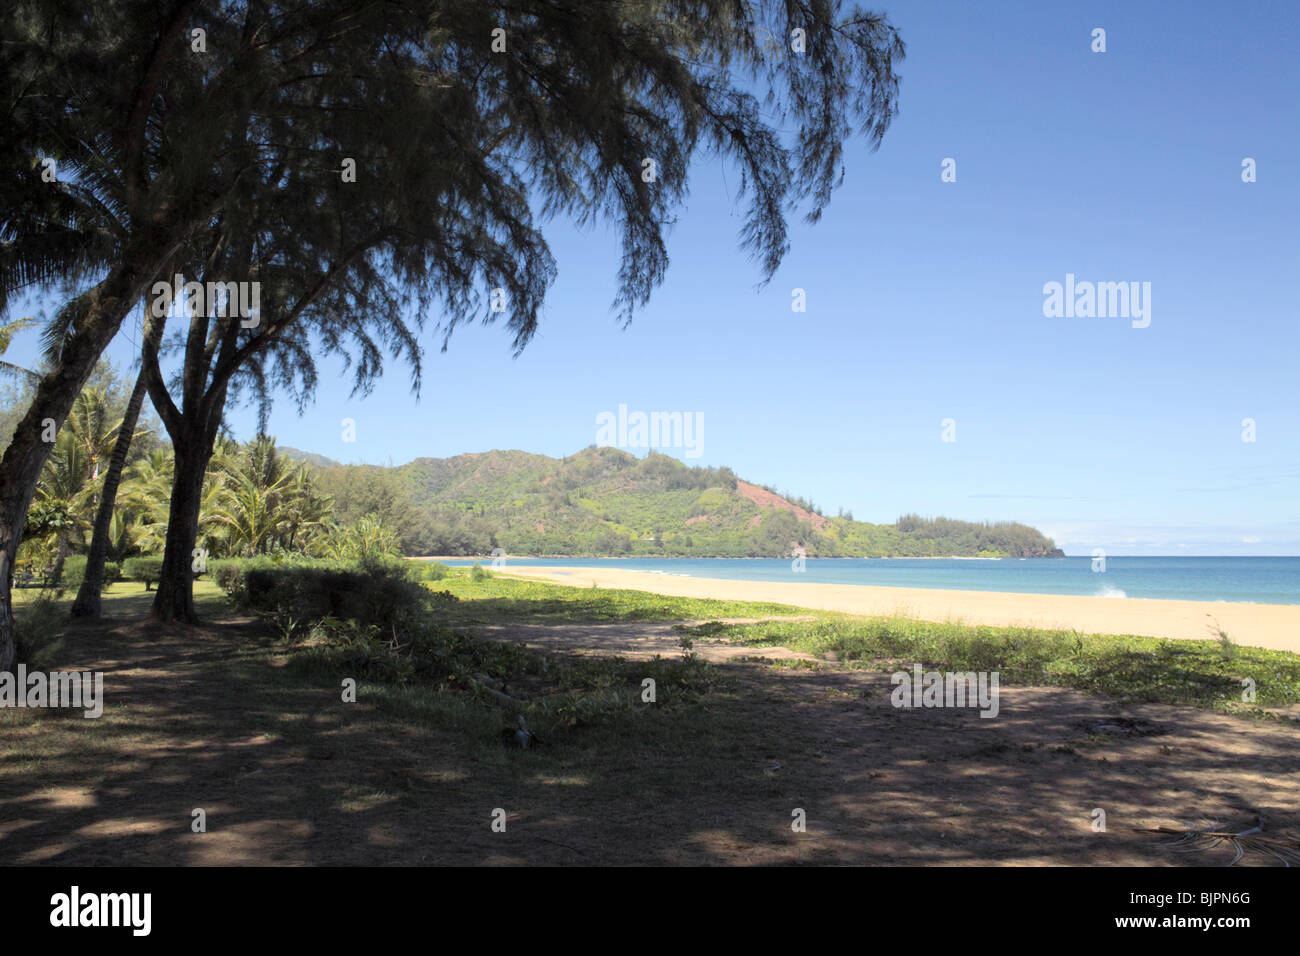 Casuarina trees on Pinetrees Beach Hanalei Bay Kauai Hawaii - Stock Image